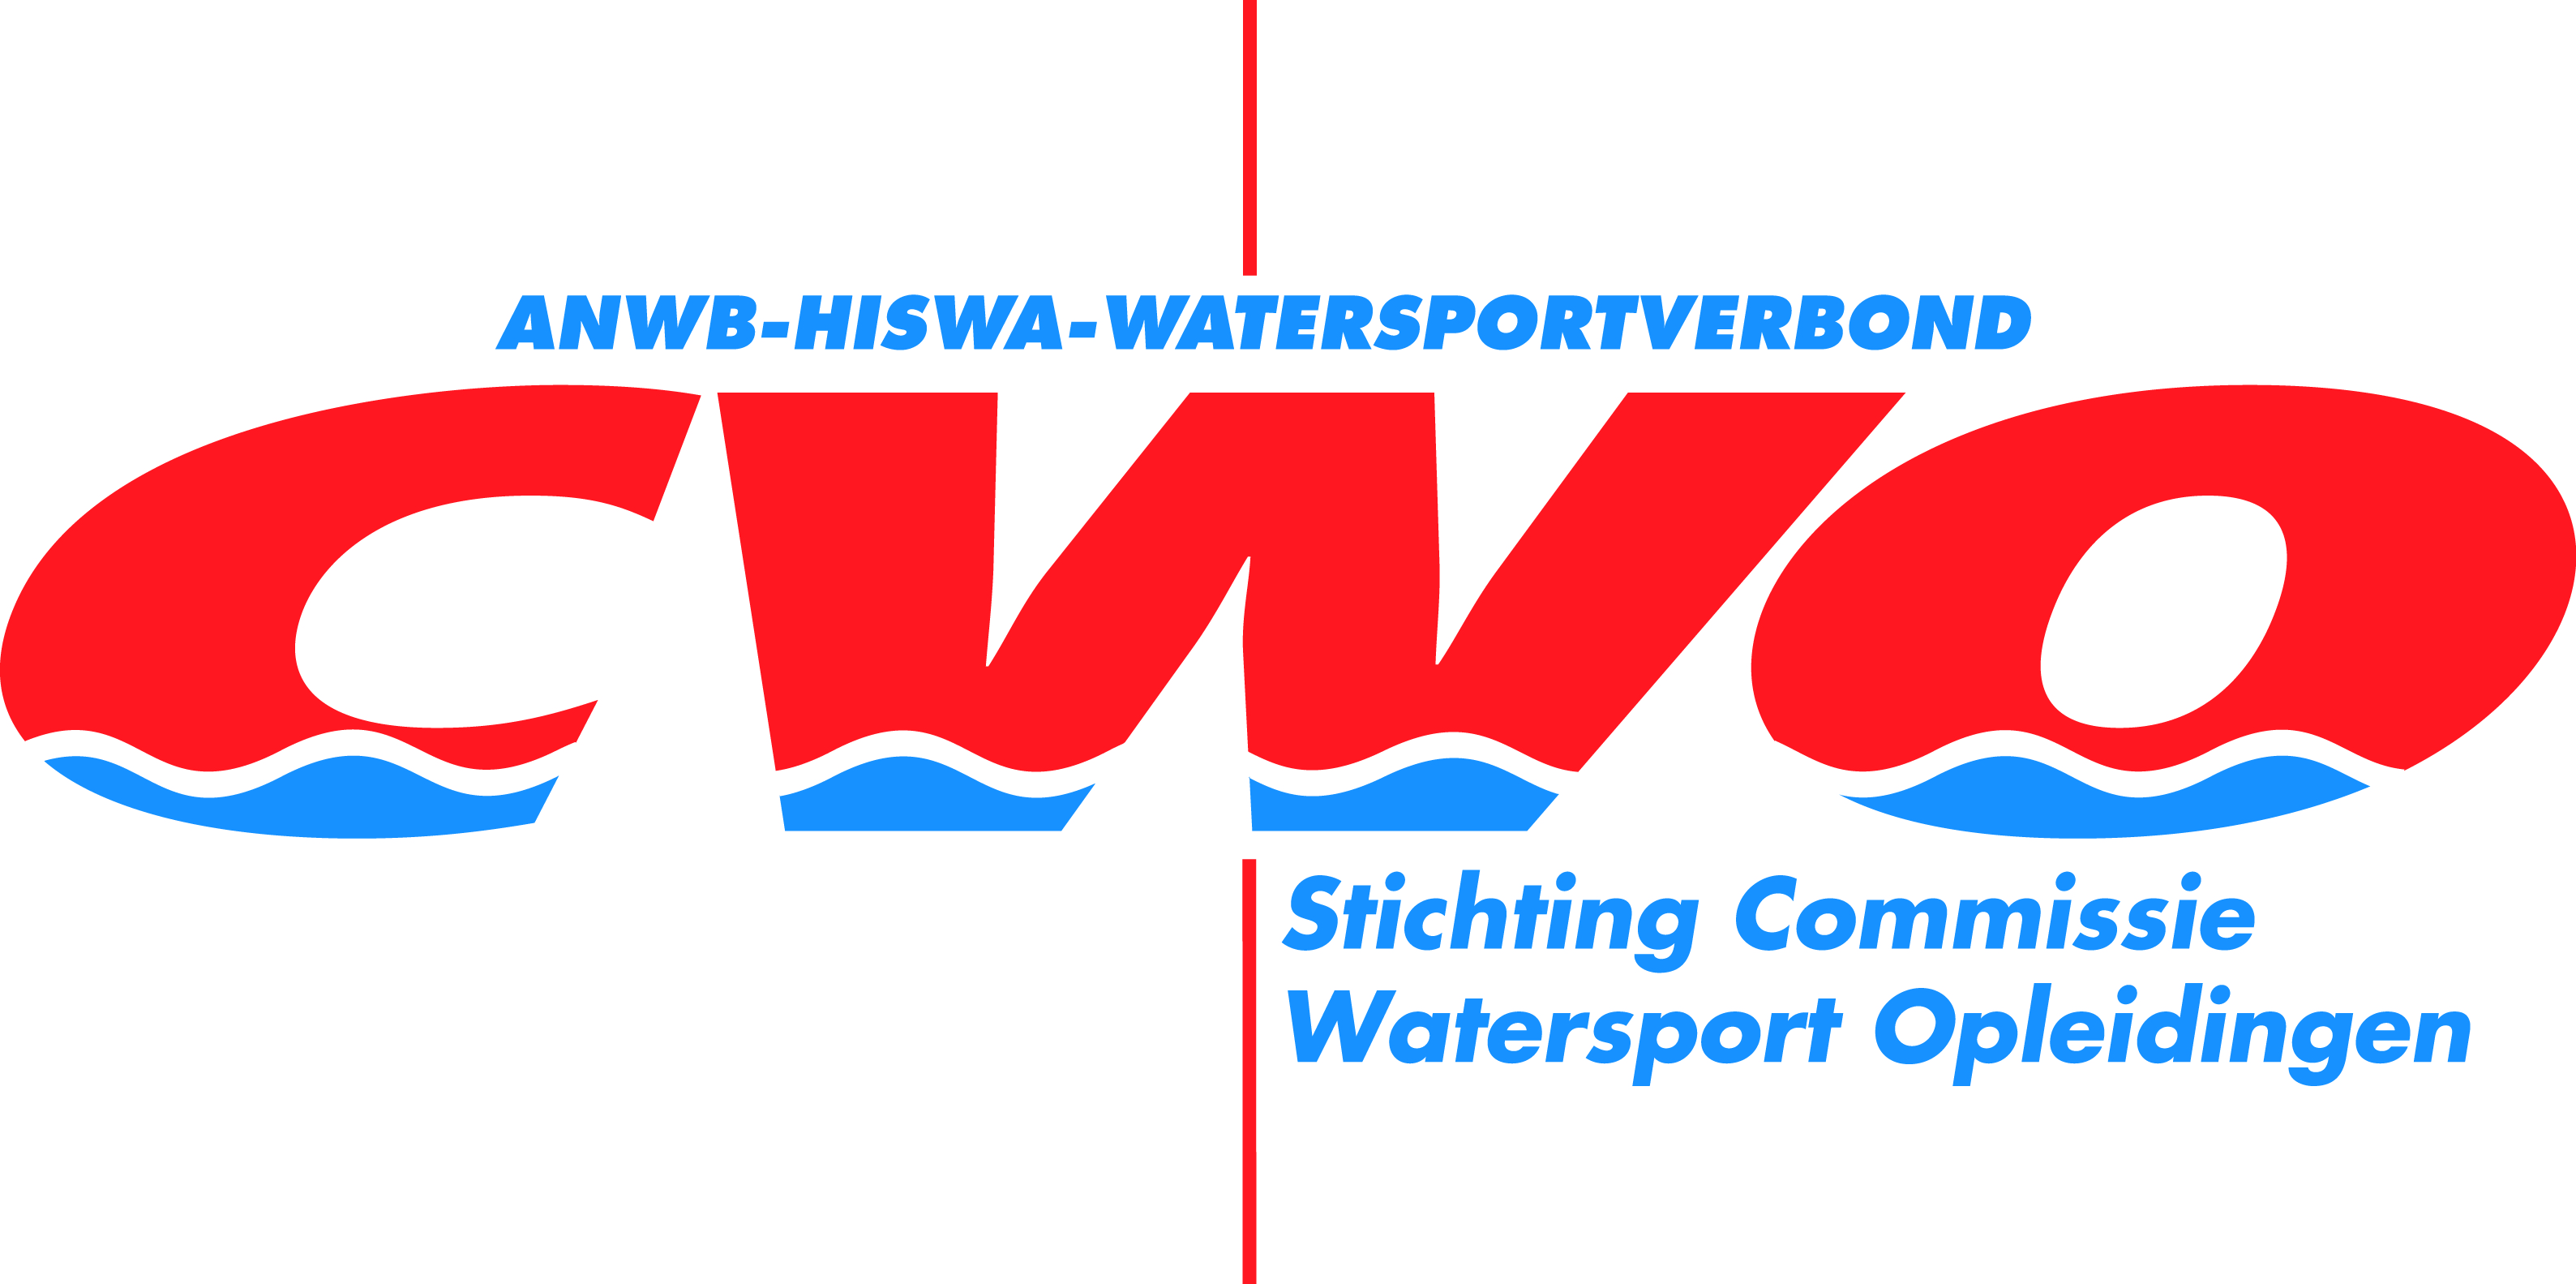 CWO logo